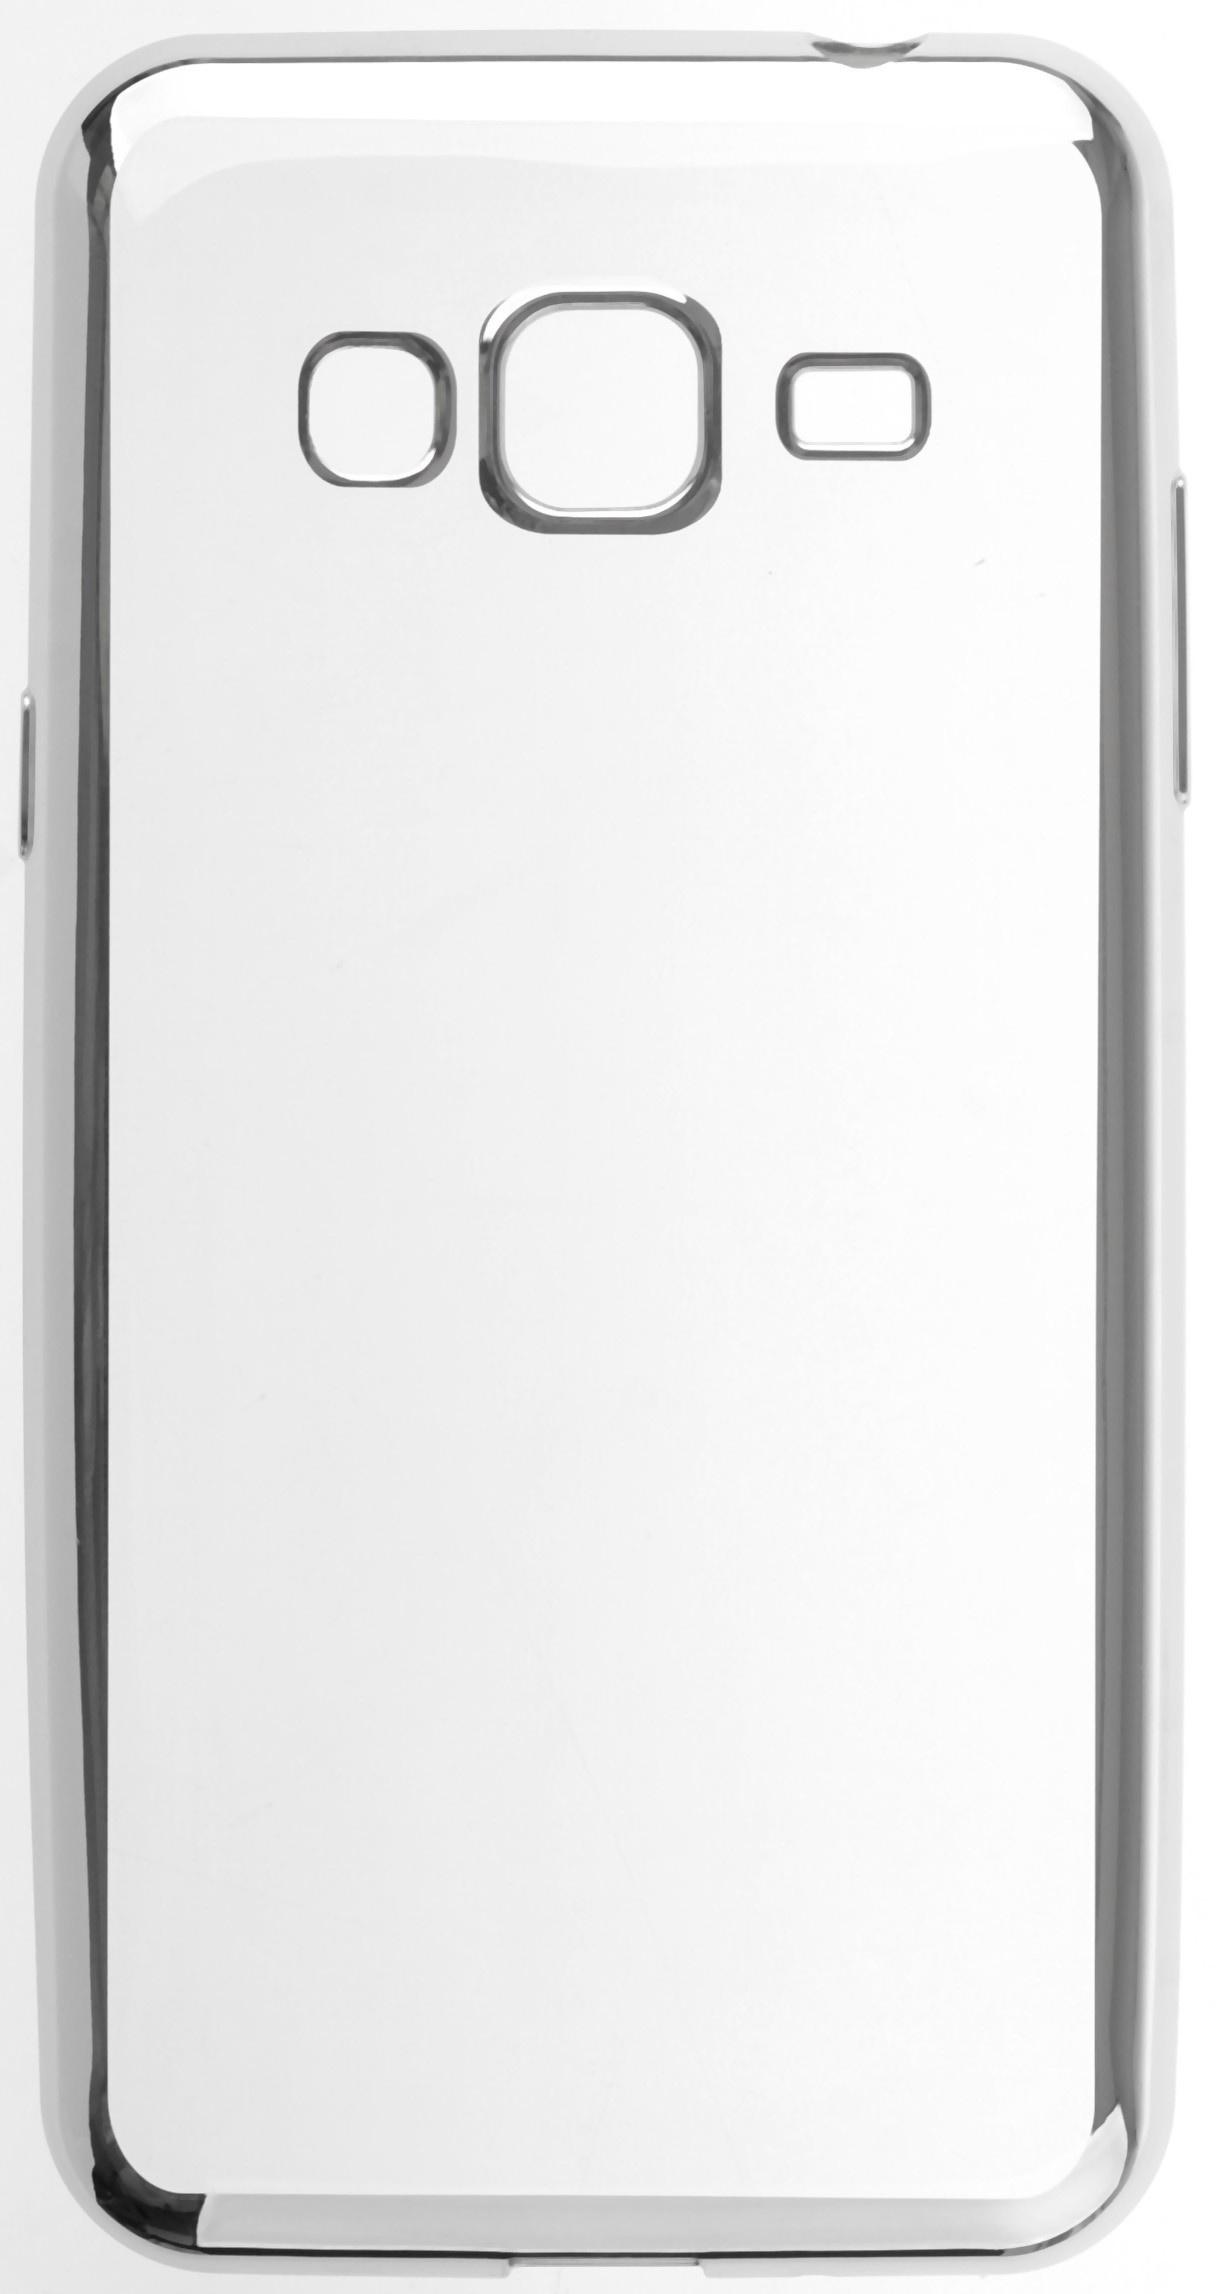 Чехол для сотового телефона skinBOX Silicone chrome border, 4630042528680, серебристый чехол для сотового телефона skinbox silicone chrome border 4630042524514 серебристый